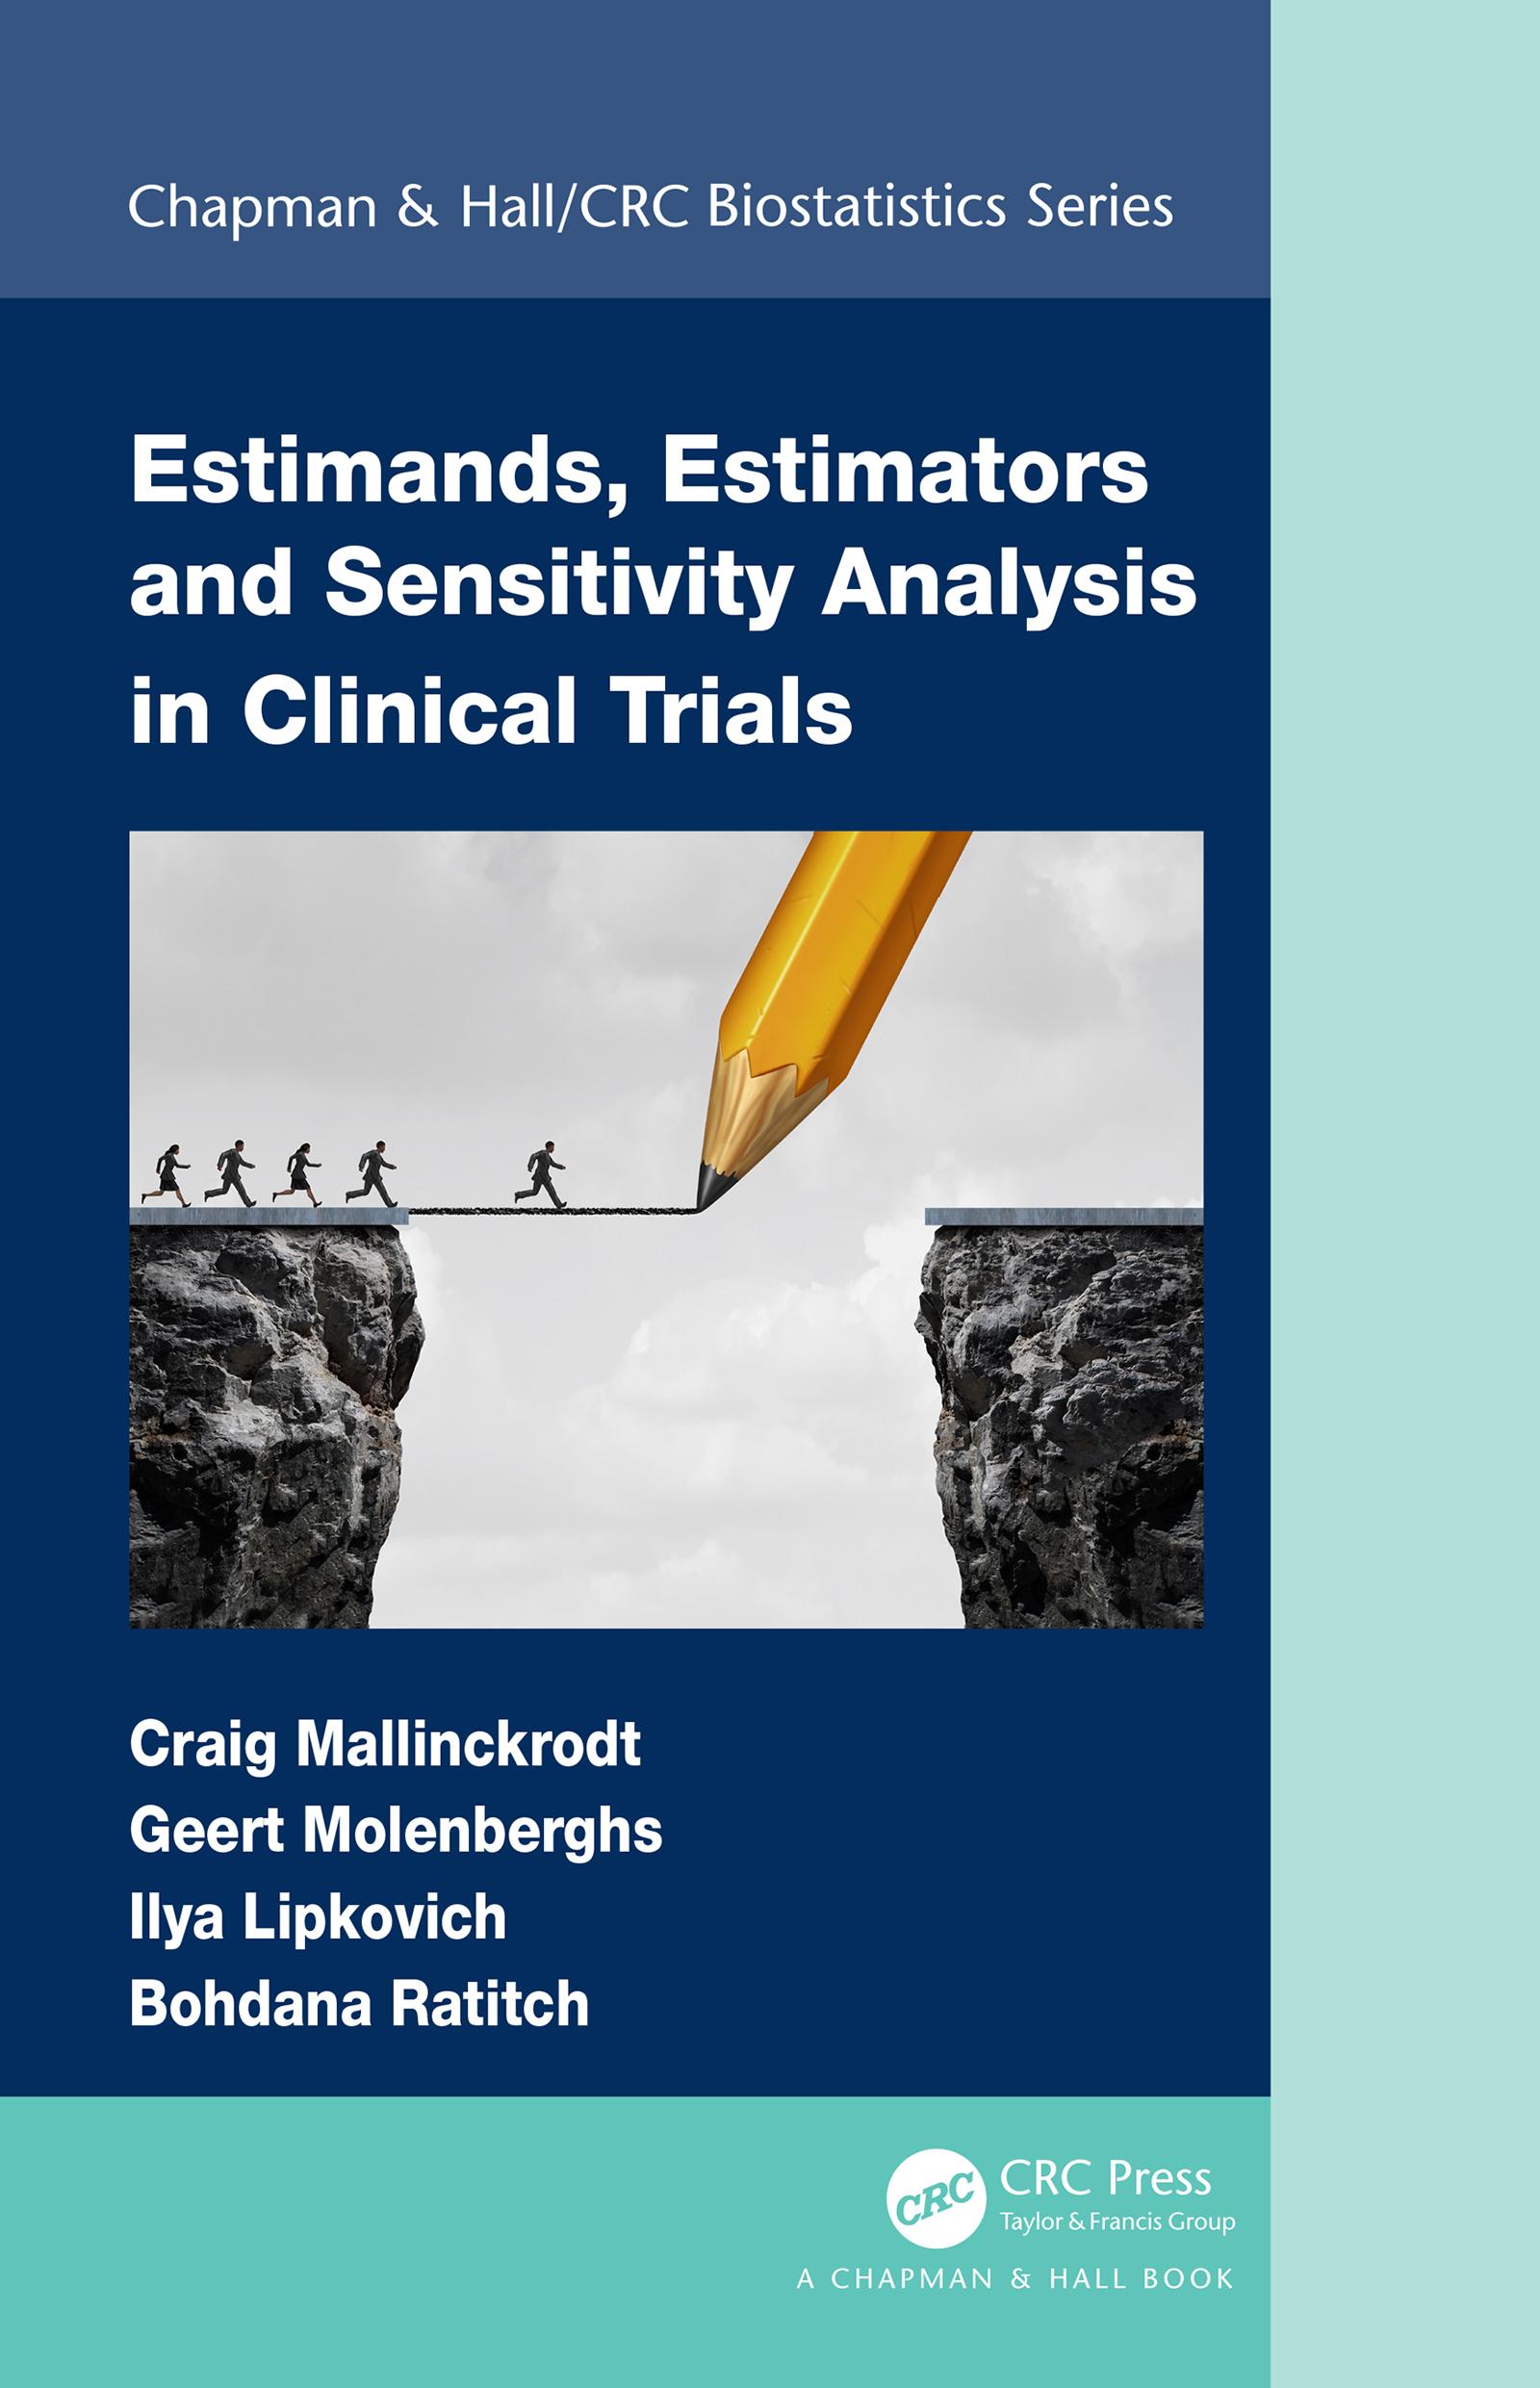 Estimands, Estimators and Sensitivity Analysis in Clinical Trials